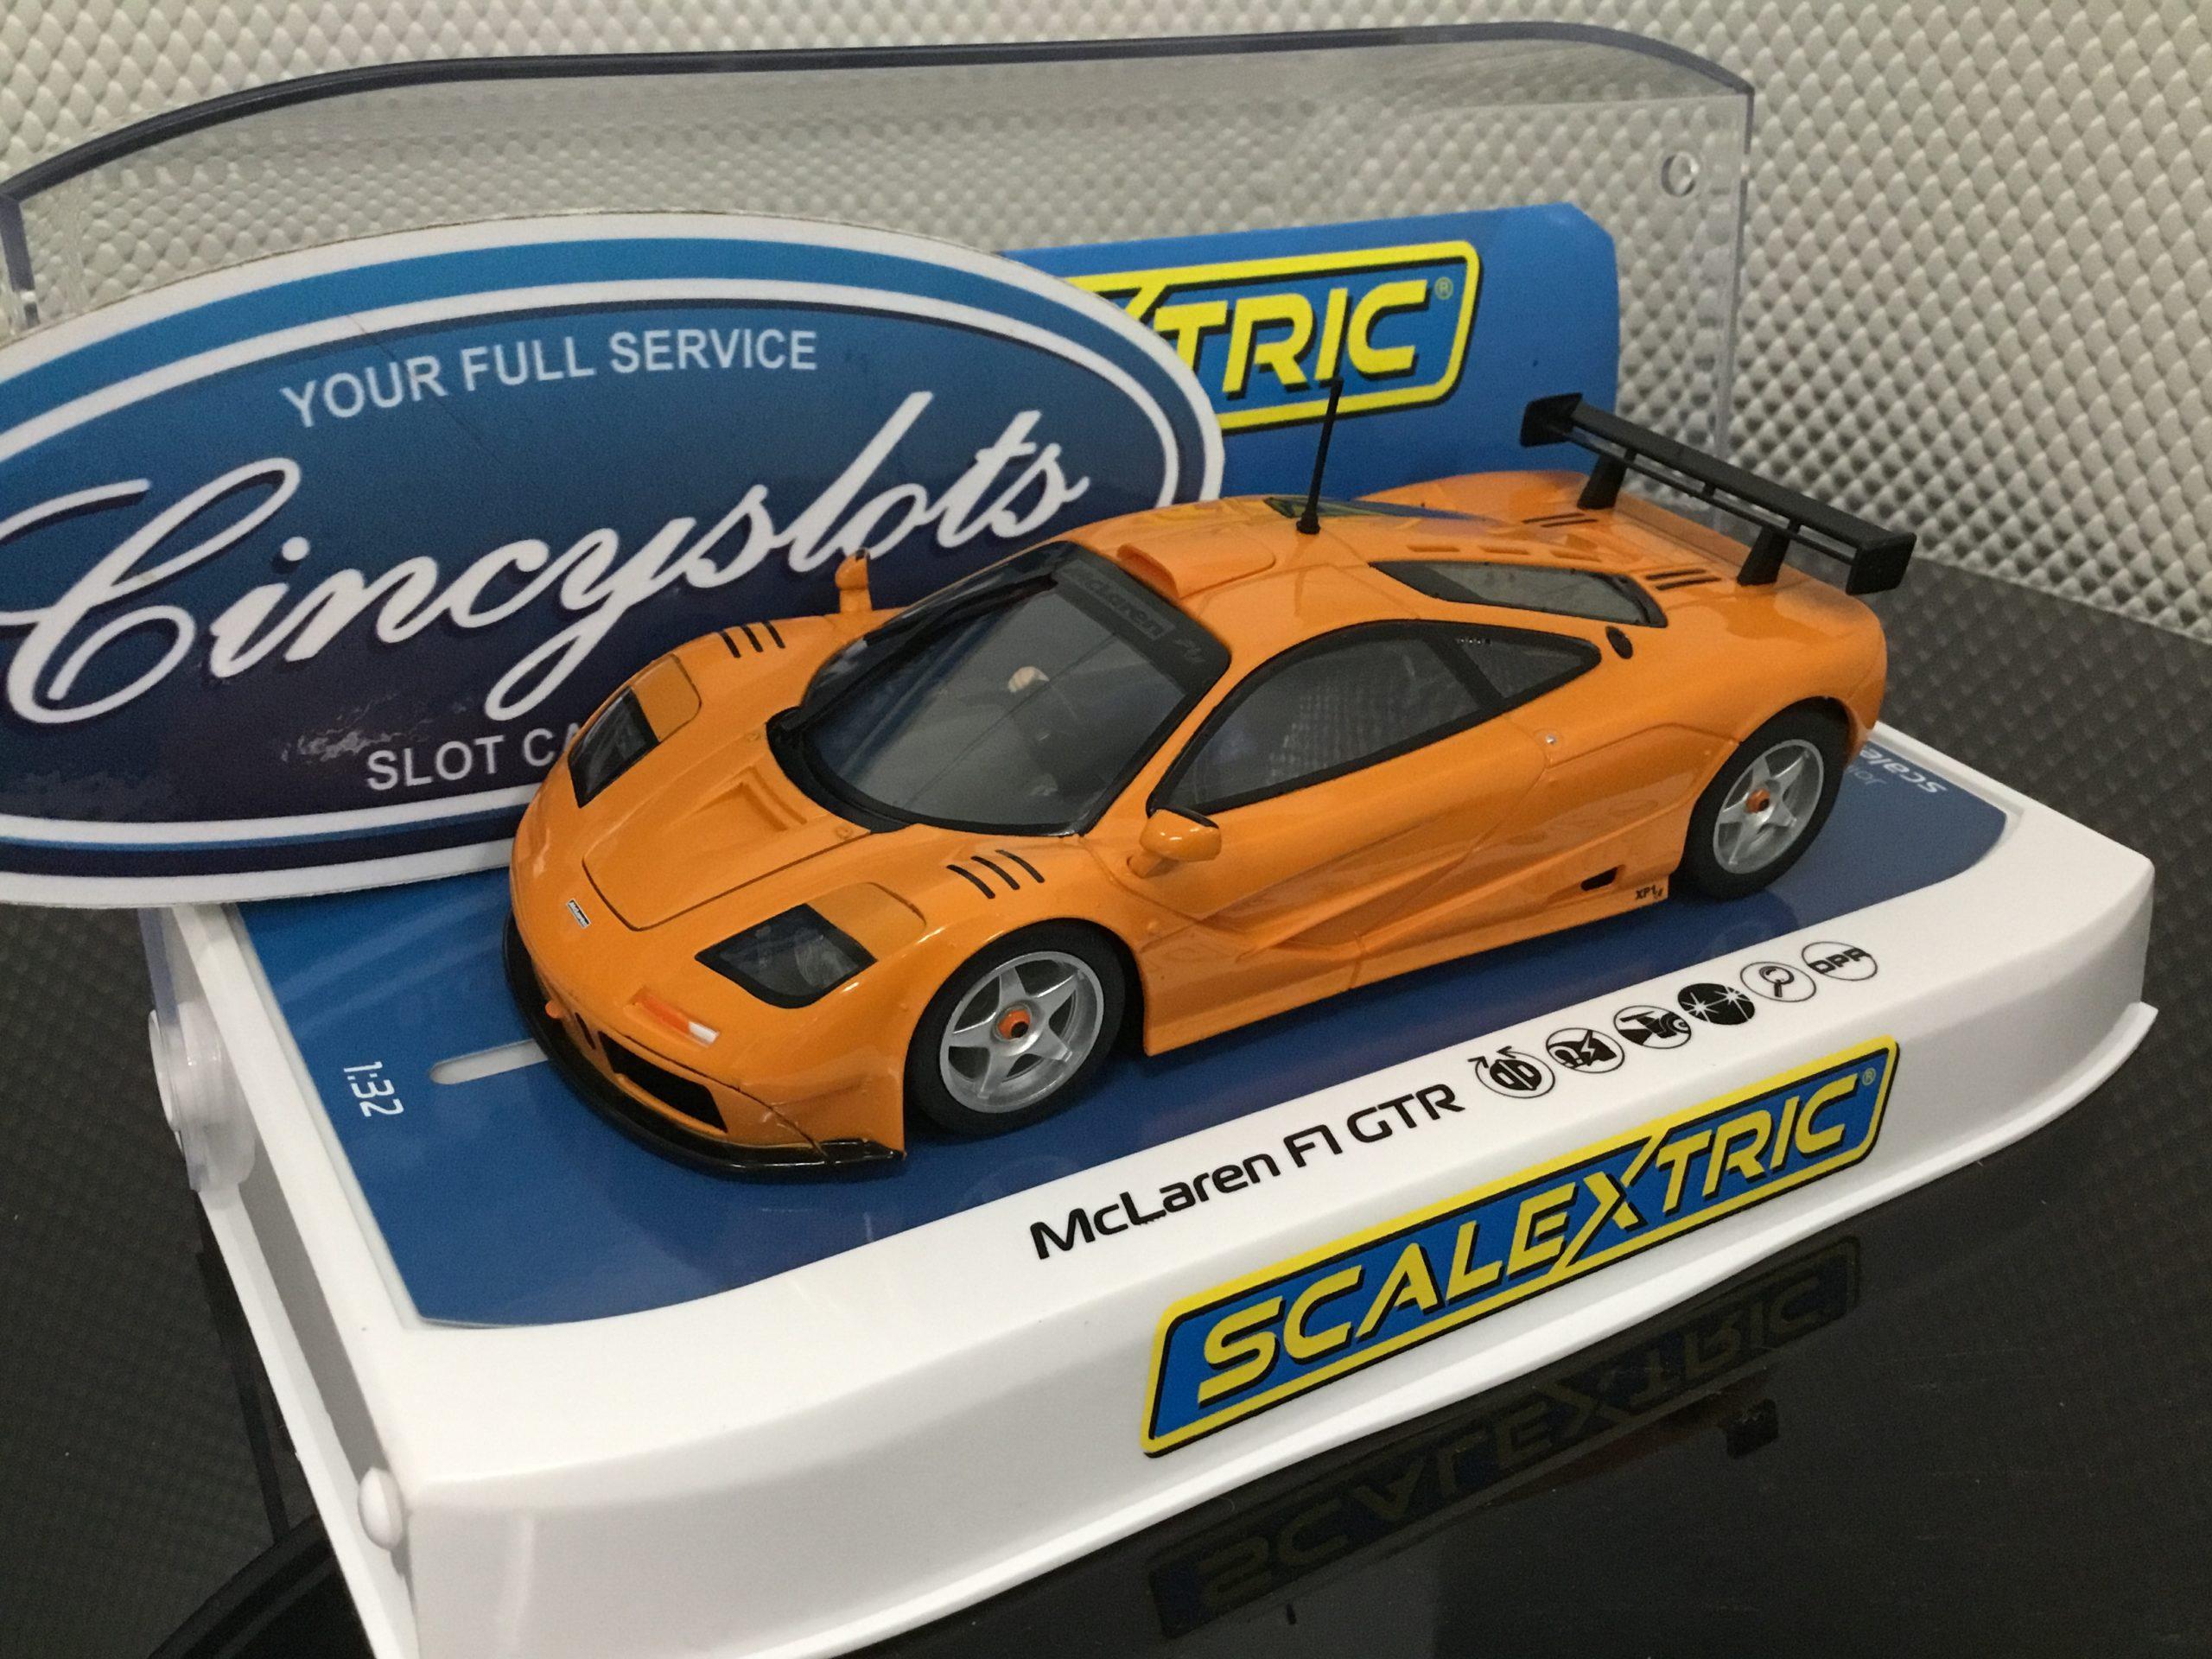 Scalextric C4102 McLaren F1 GTR Papaya Orange 1/32 Slot Car.